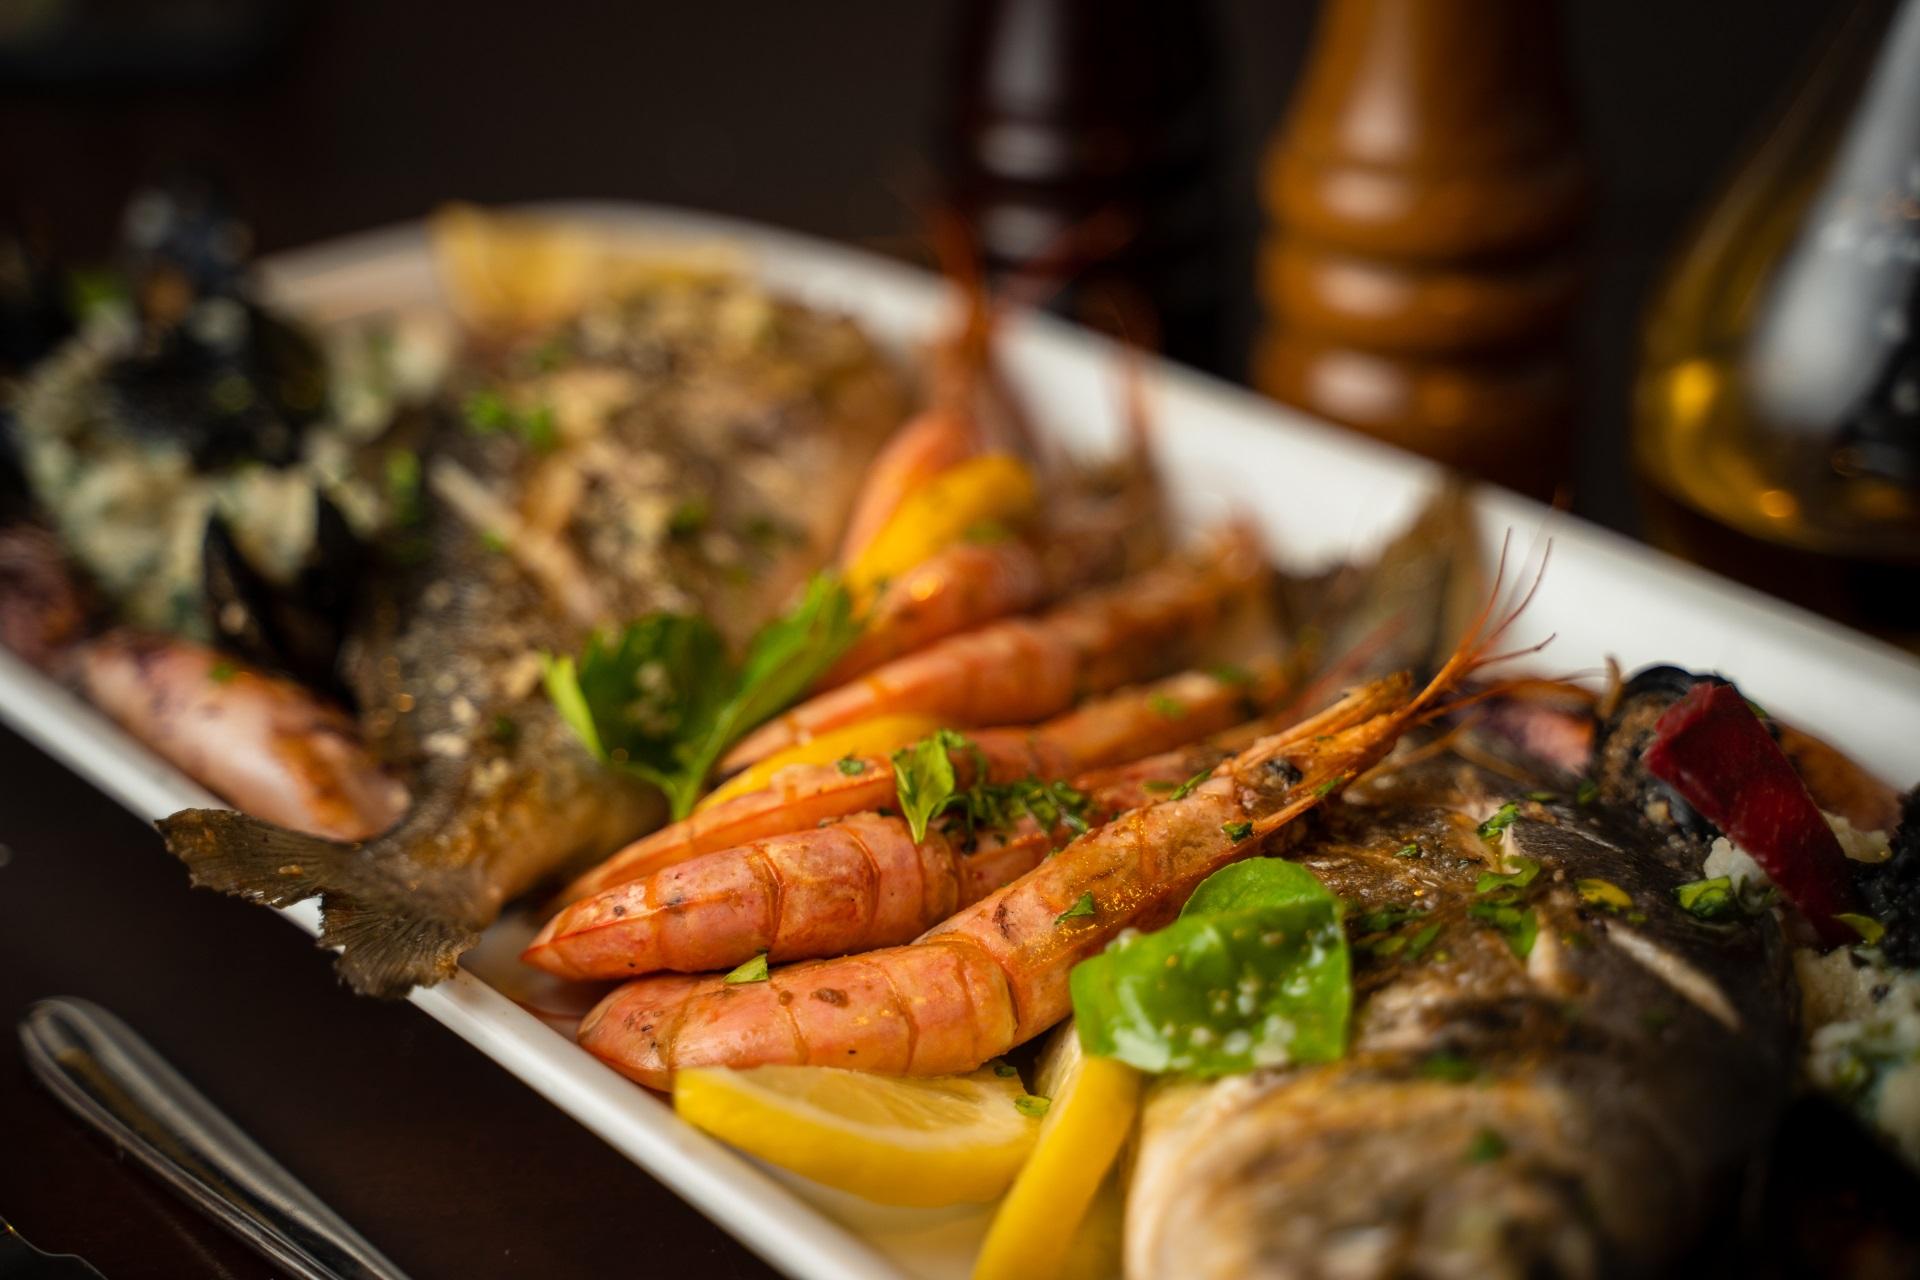 portun fish plate